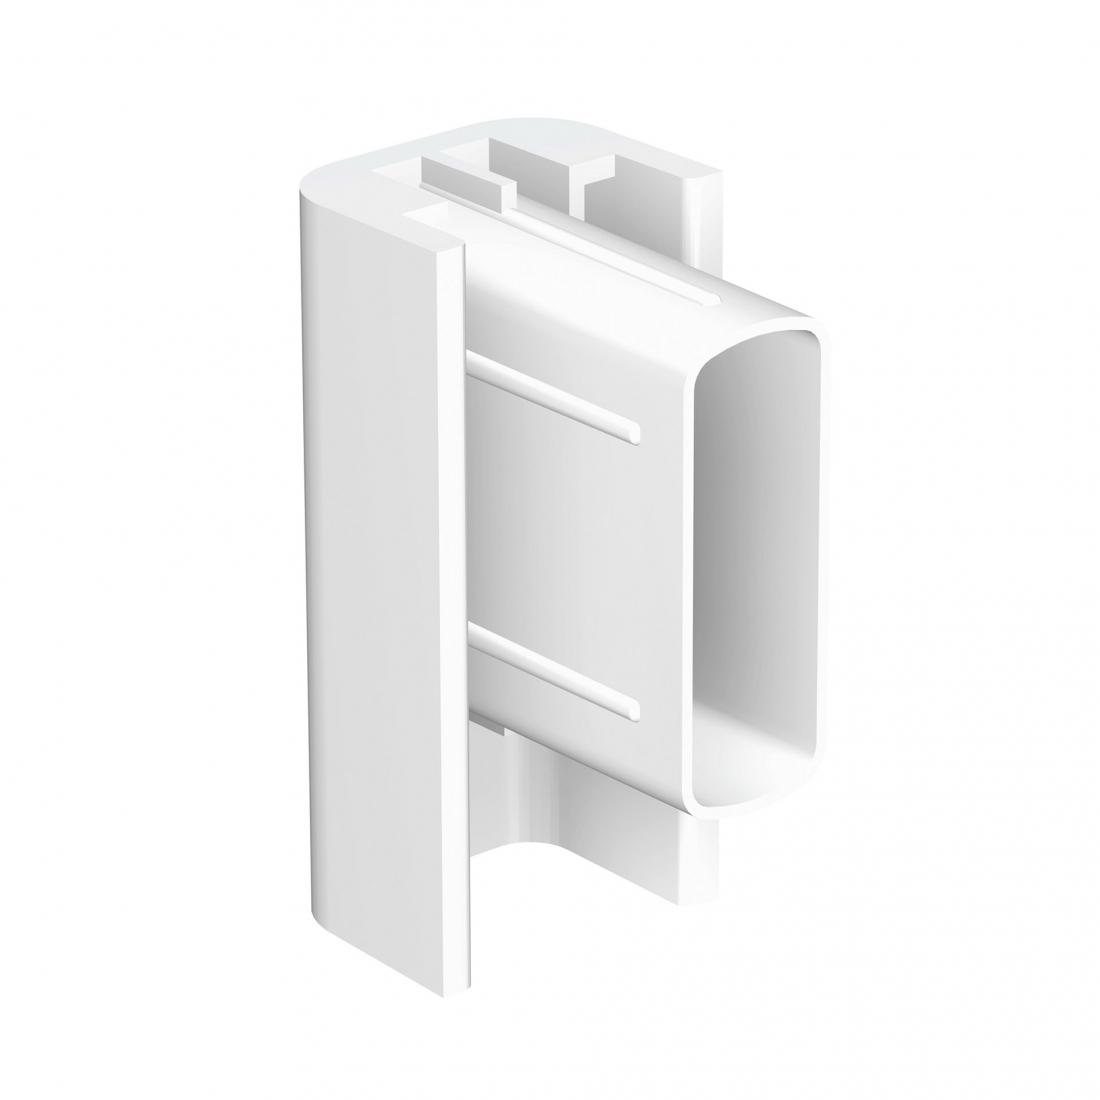 final de guia blanco para tira de perfil riel guia para colgar cuadros sin hacer agujeros, de pared, artiteq rail 30 kg